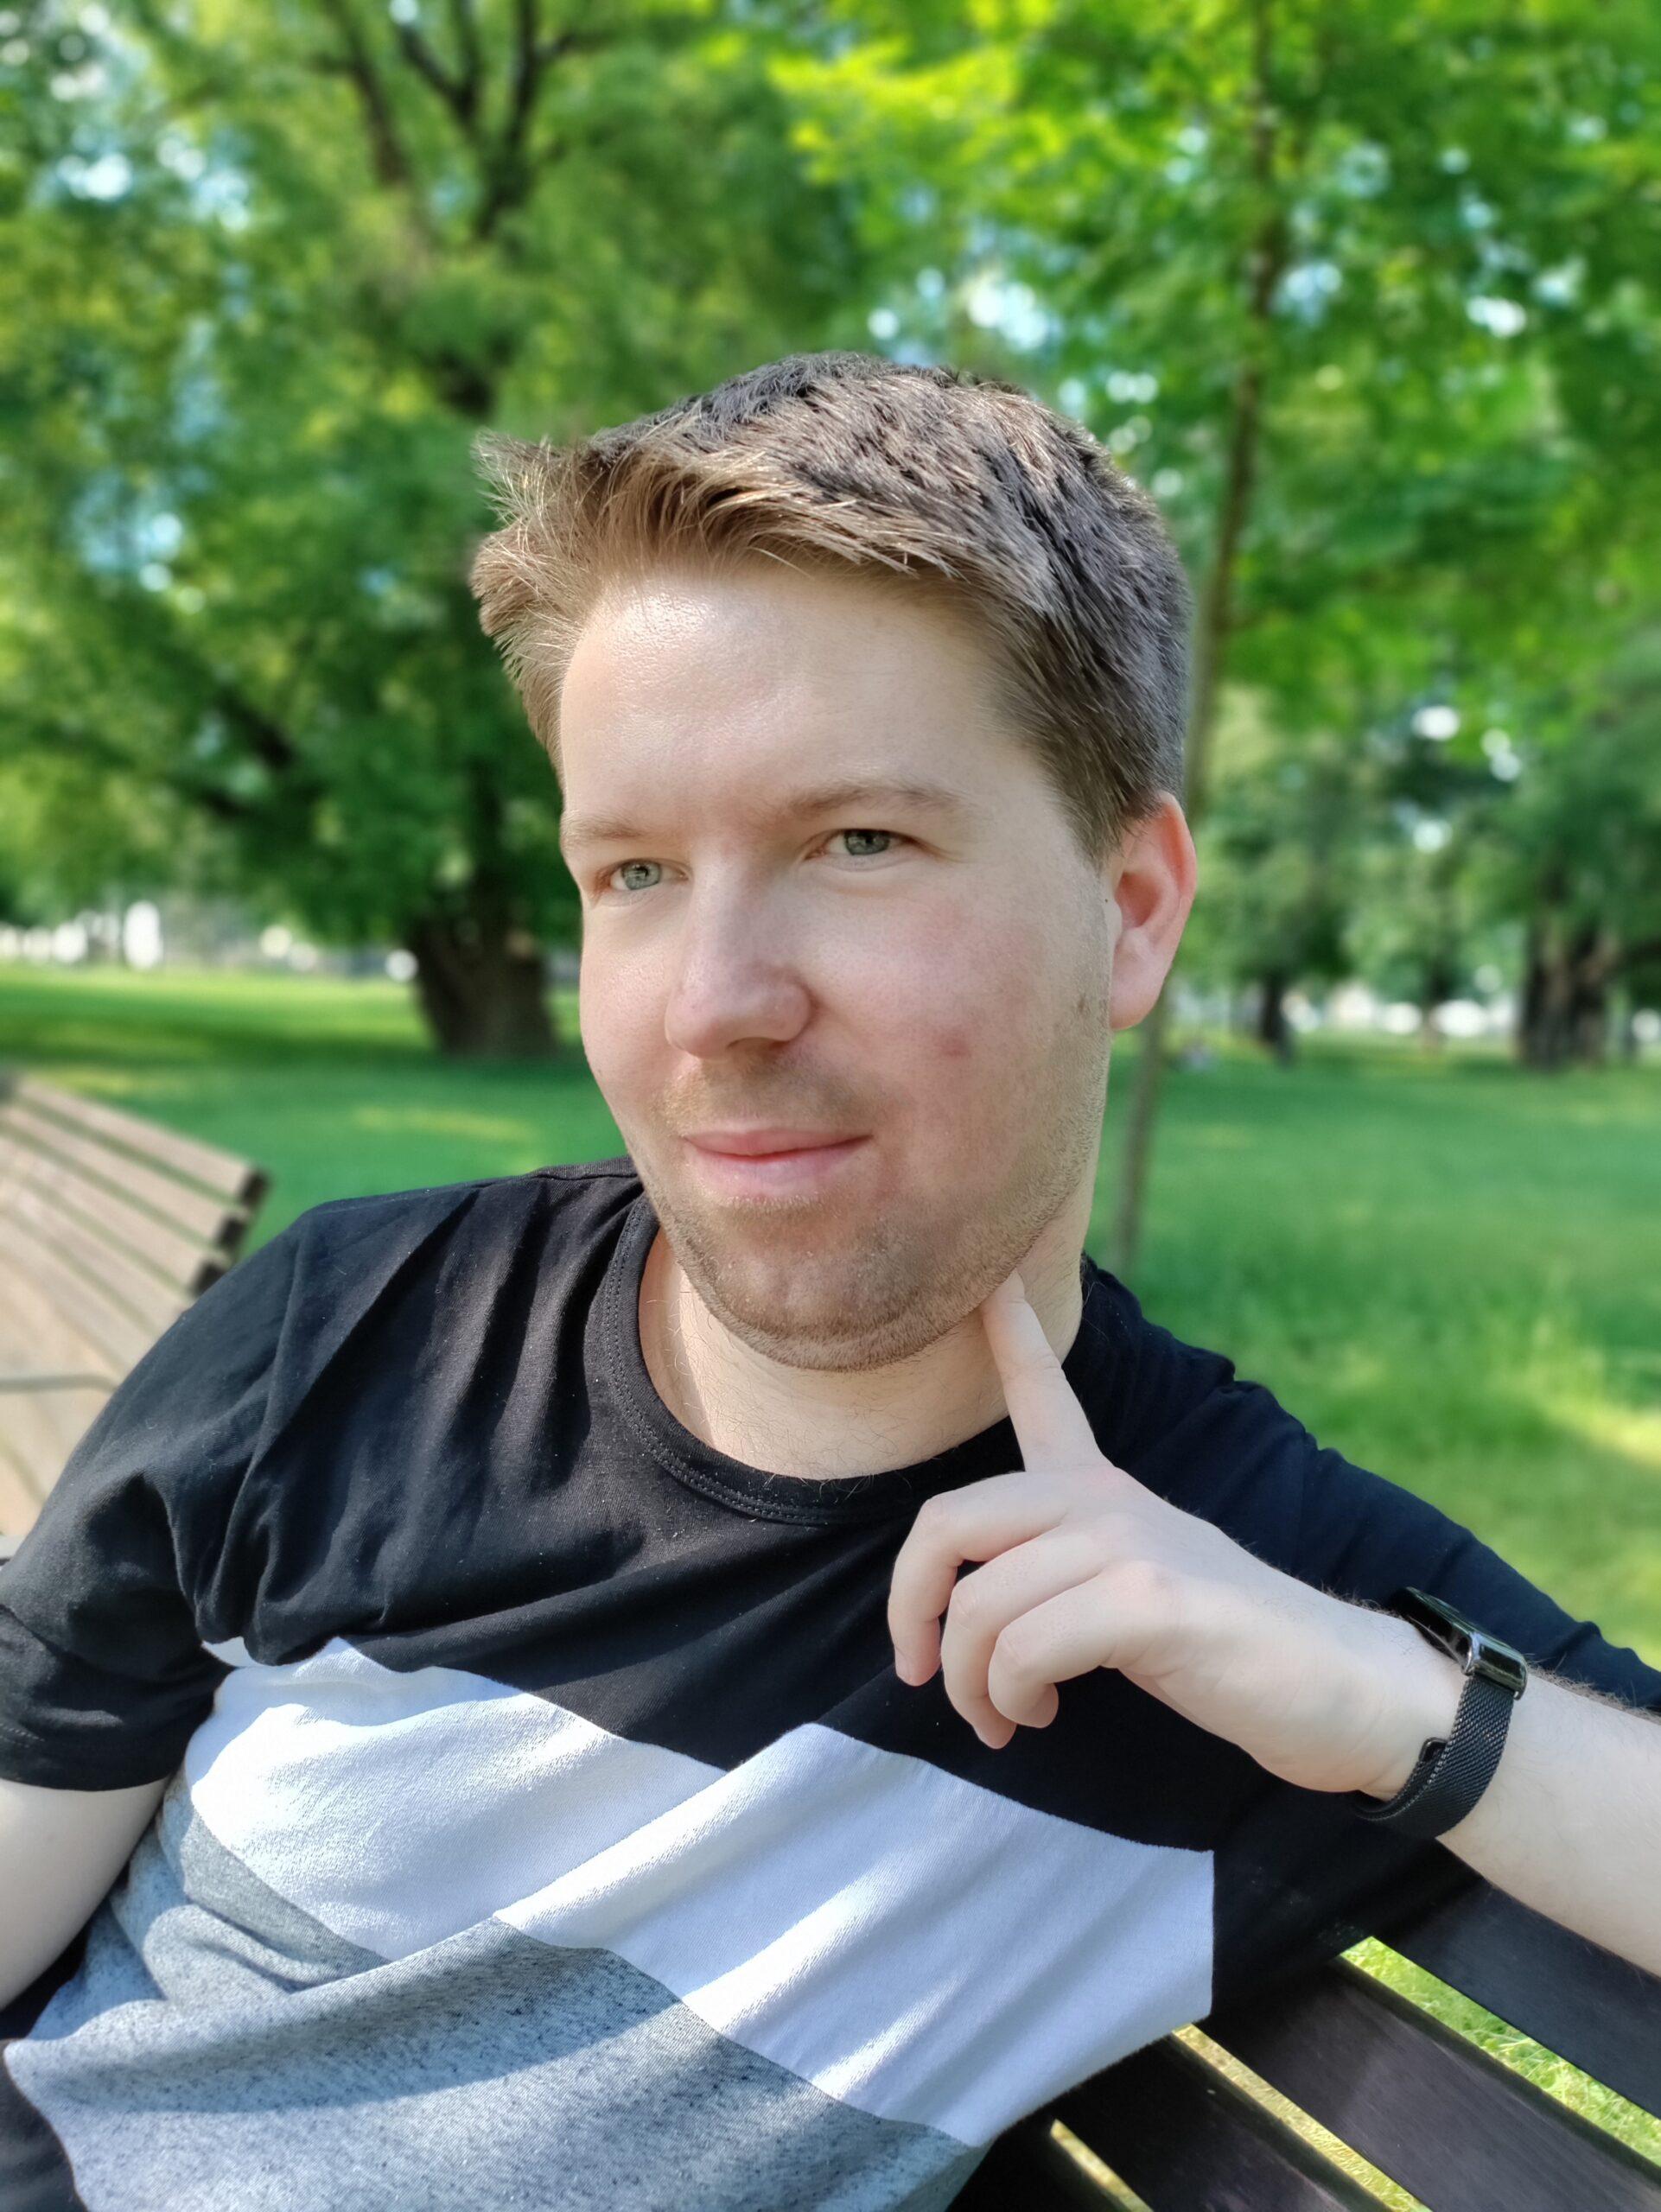 OnePlus Nord CE portrét